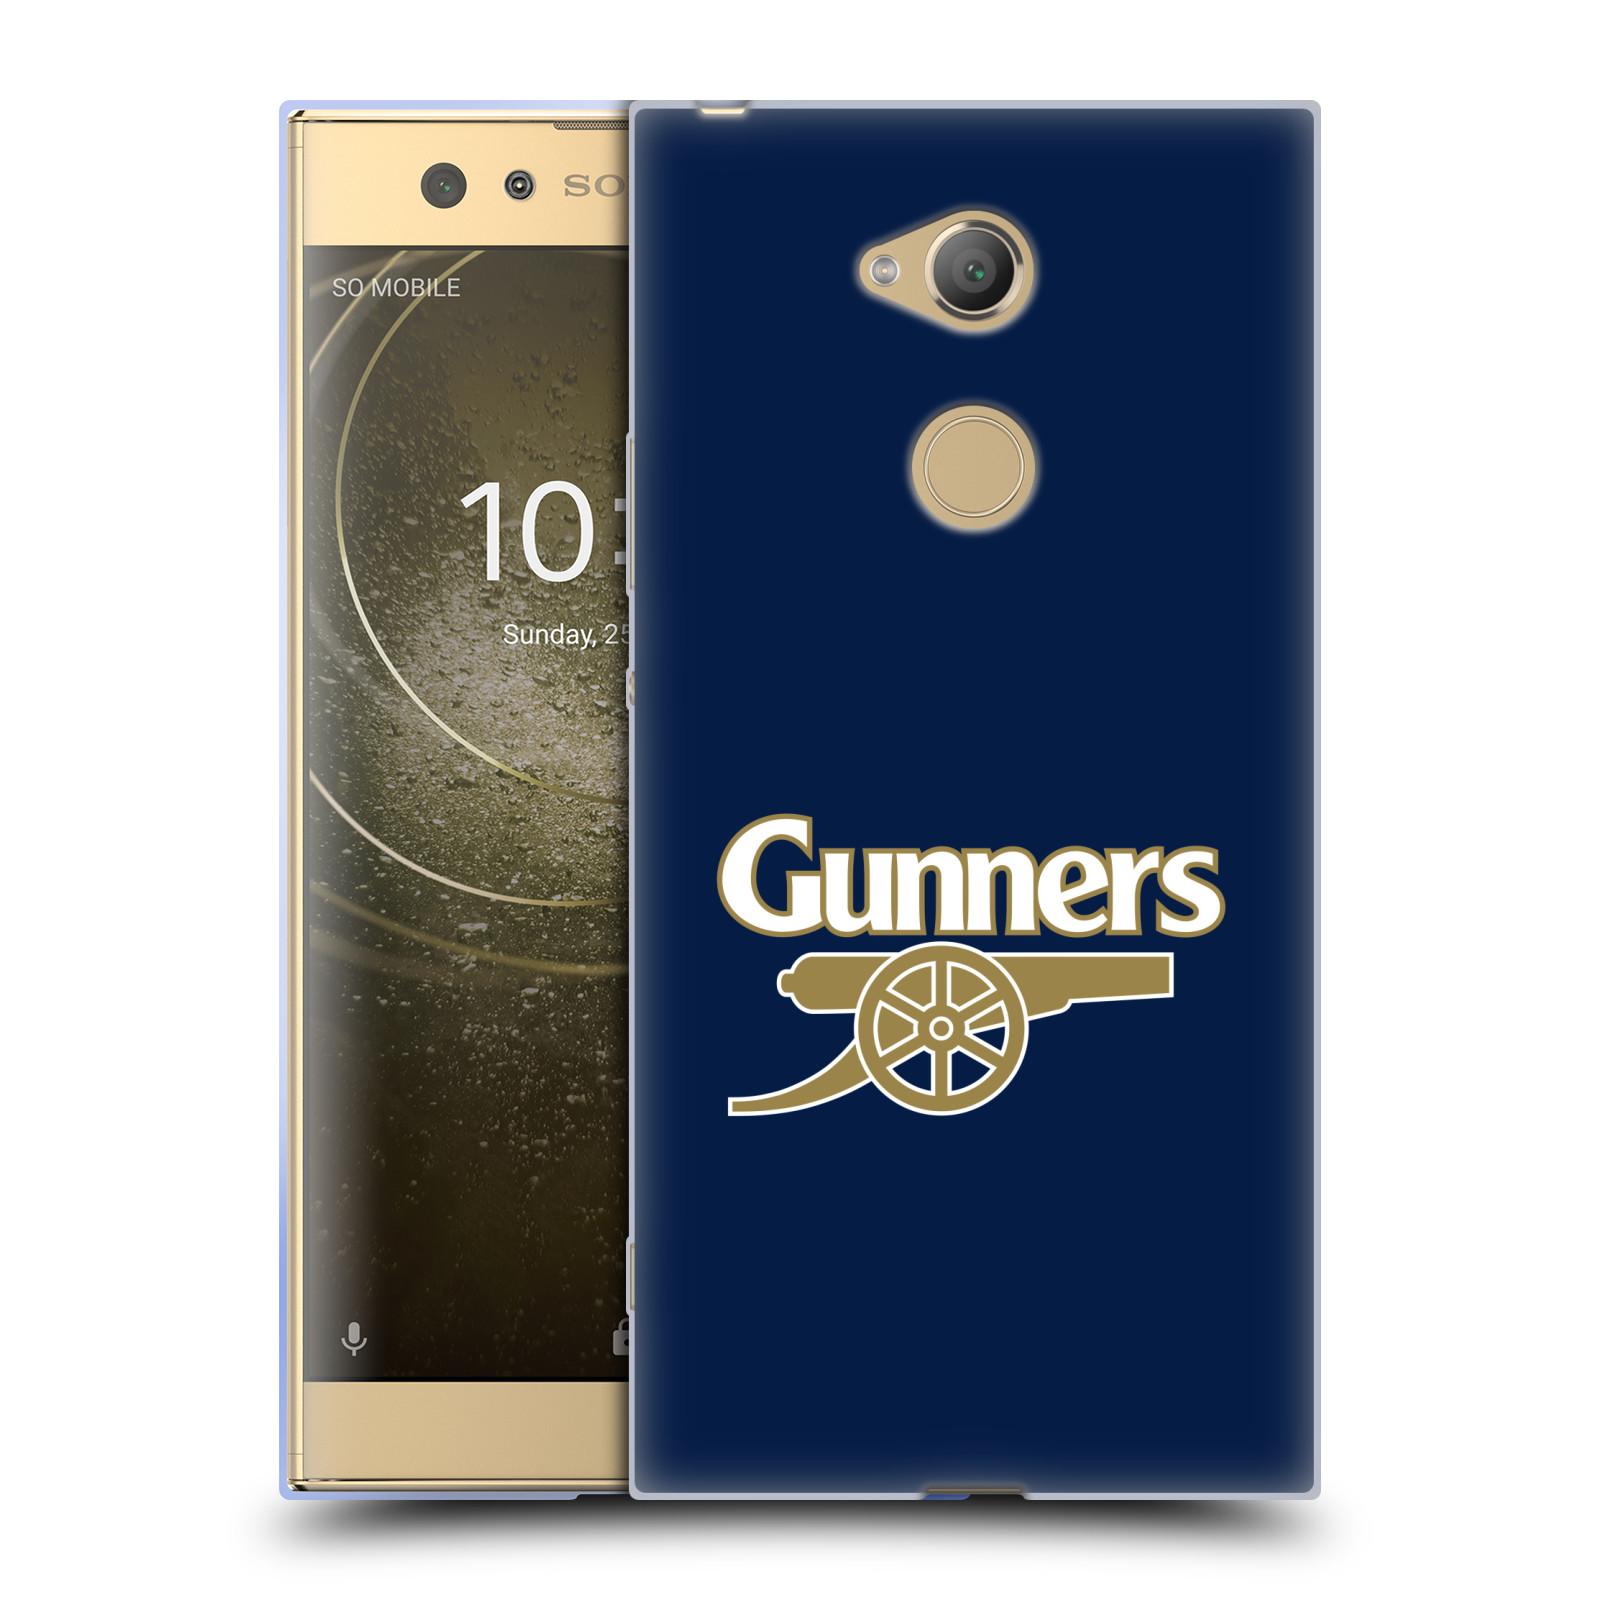 Silikonové pouzdro na mobil Sony Xperia XA2 Ultra - Head Case - Arsenal FC - Gunners